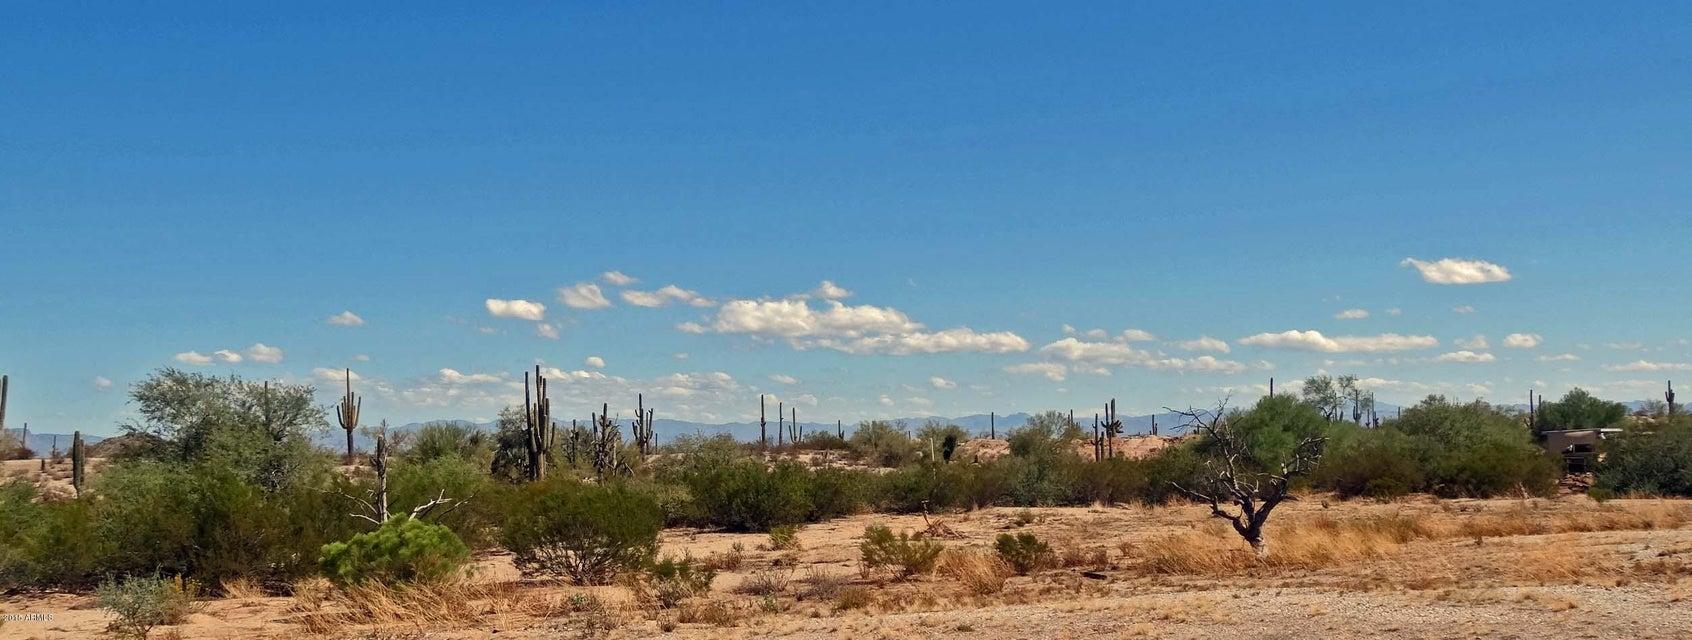 28427 N Mildred Road Queen Creek, AZ 85142 - MLS #: 5647961